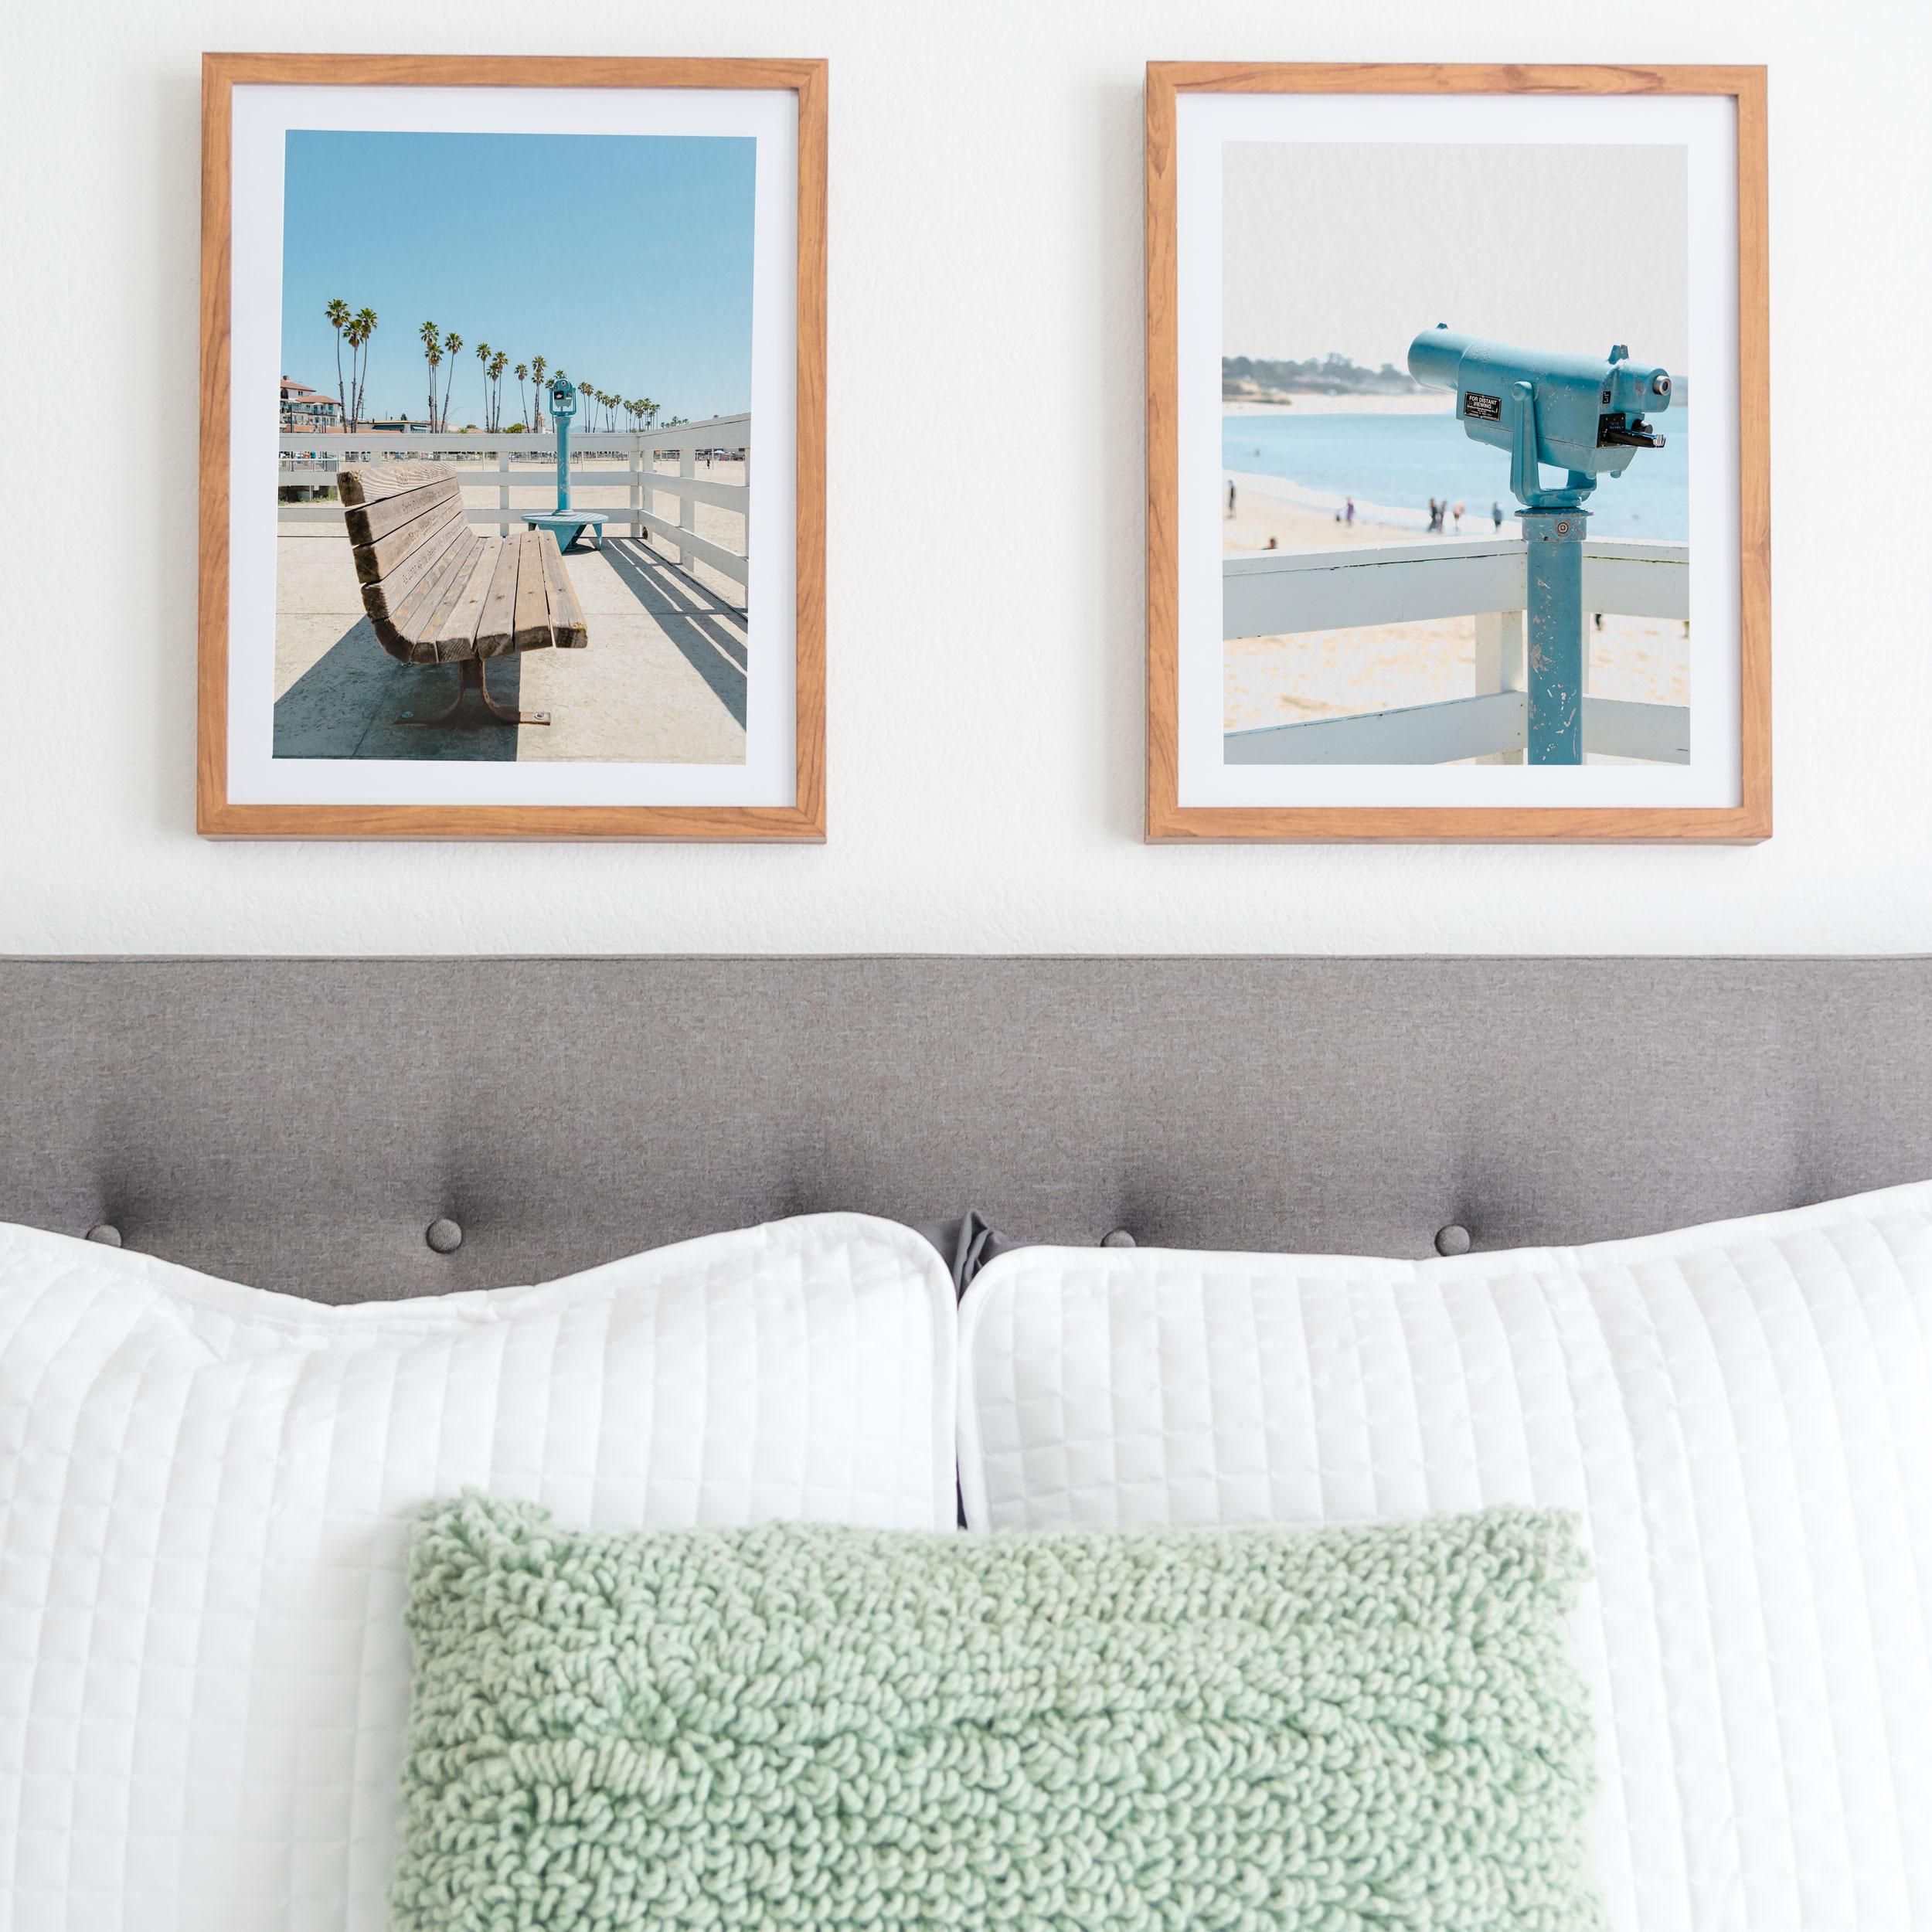 Copy of Boardwalk Bench (L) and Santa Cruz Viewfinder (R)